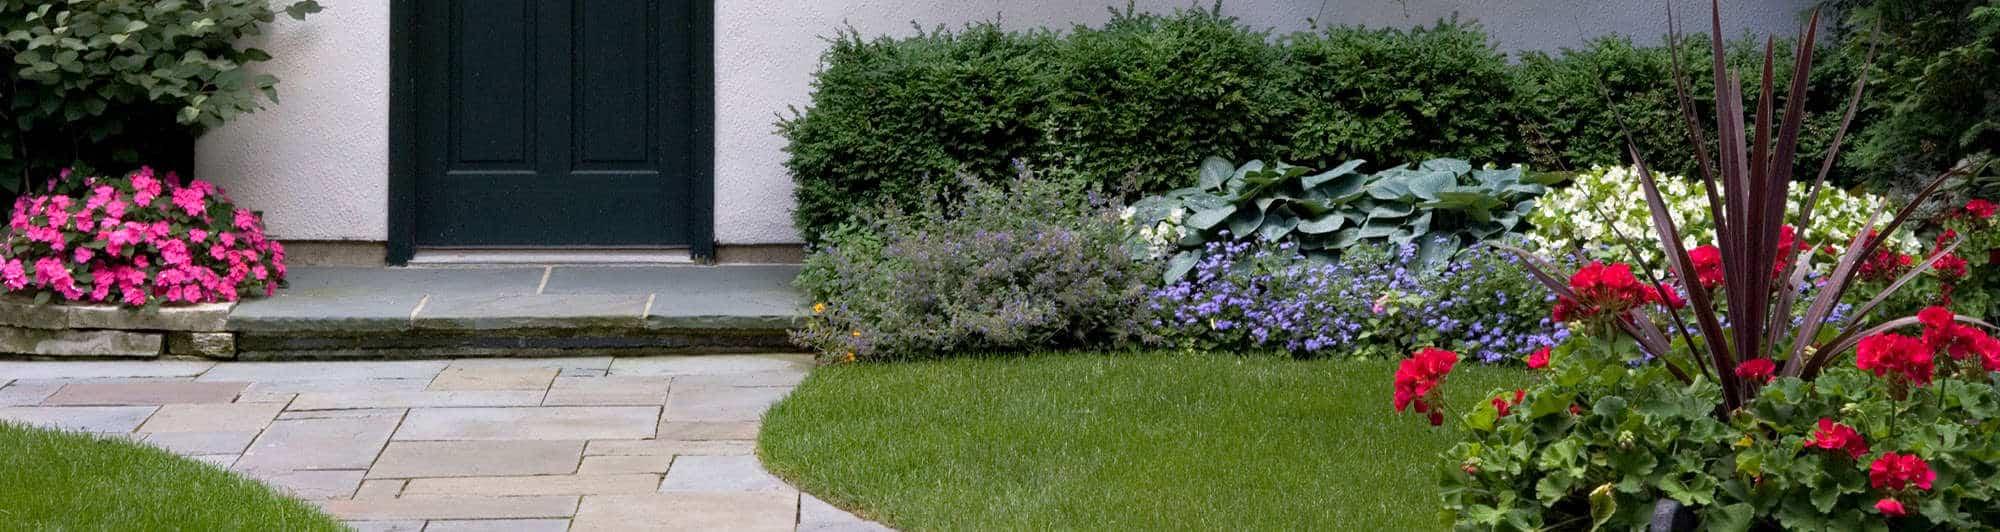 Your Local Landscape Designers, Installers U0026 Lawn Maintenance Pros